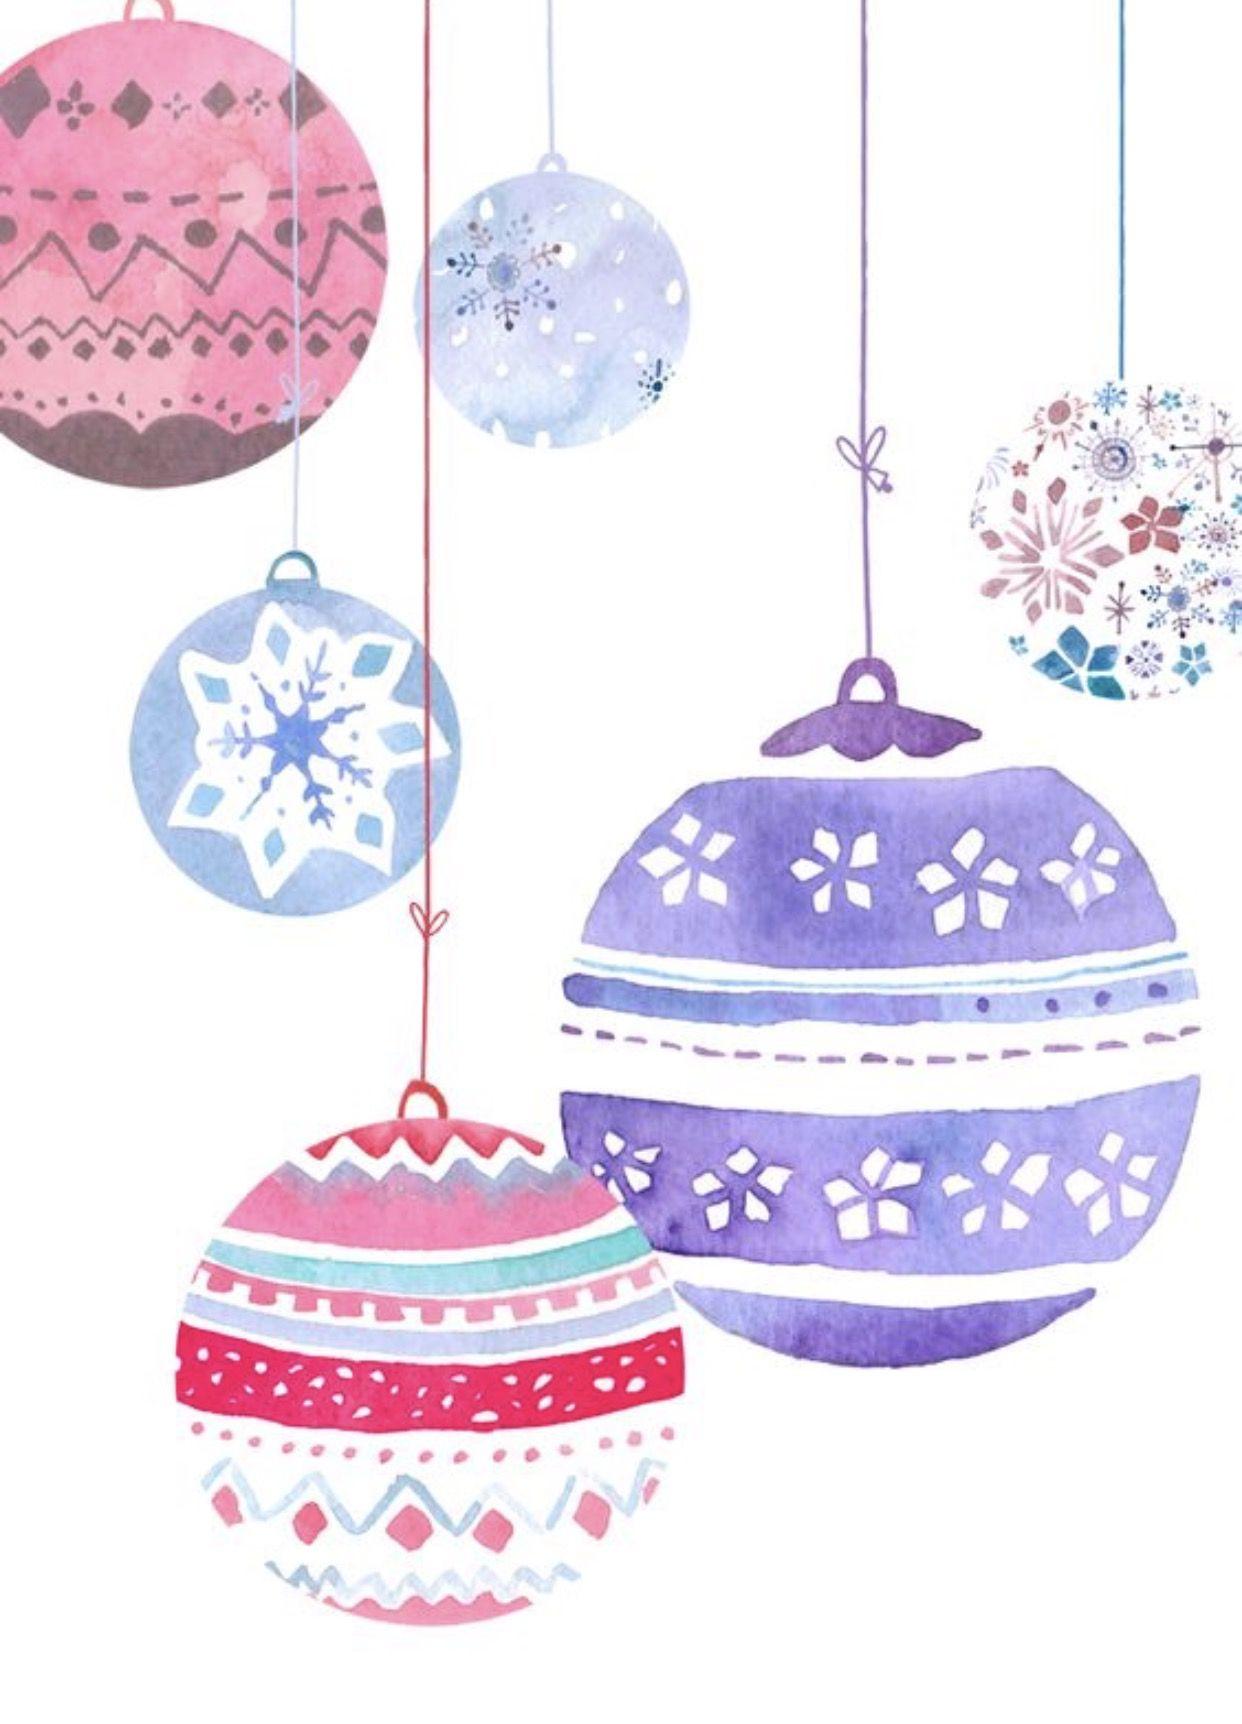 Ornaments   Christmas/Winter iPhone wallpaper ❄ ⛄   Pinterest